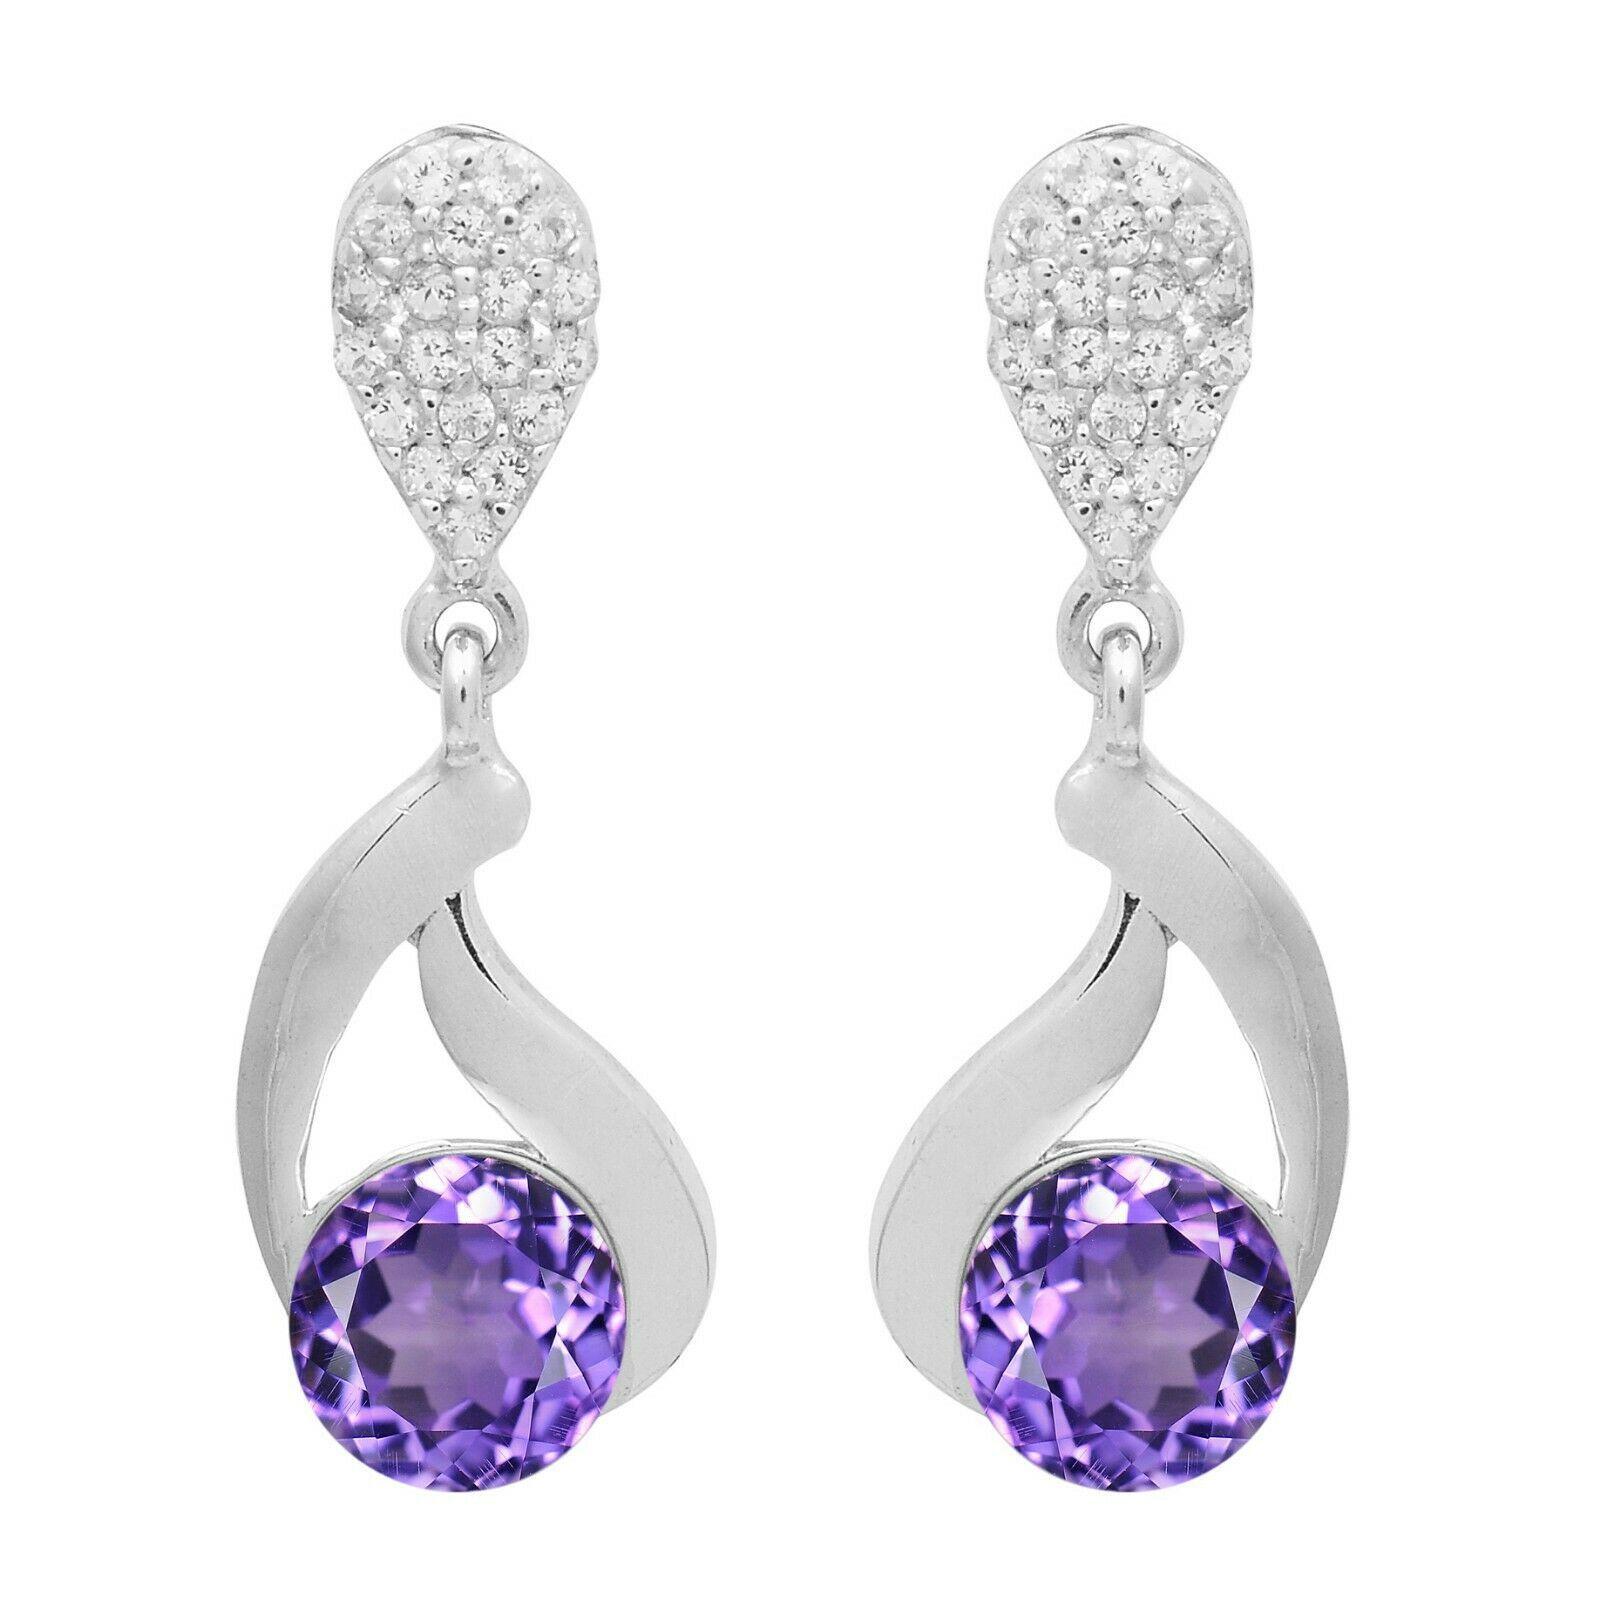 6.35 MM Amethyst White Topaz 925 Sterling Silver Dangle Hollow Wedding Earring